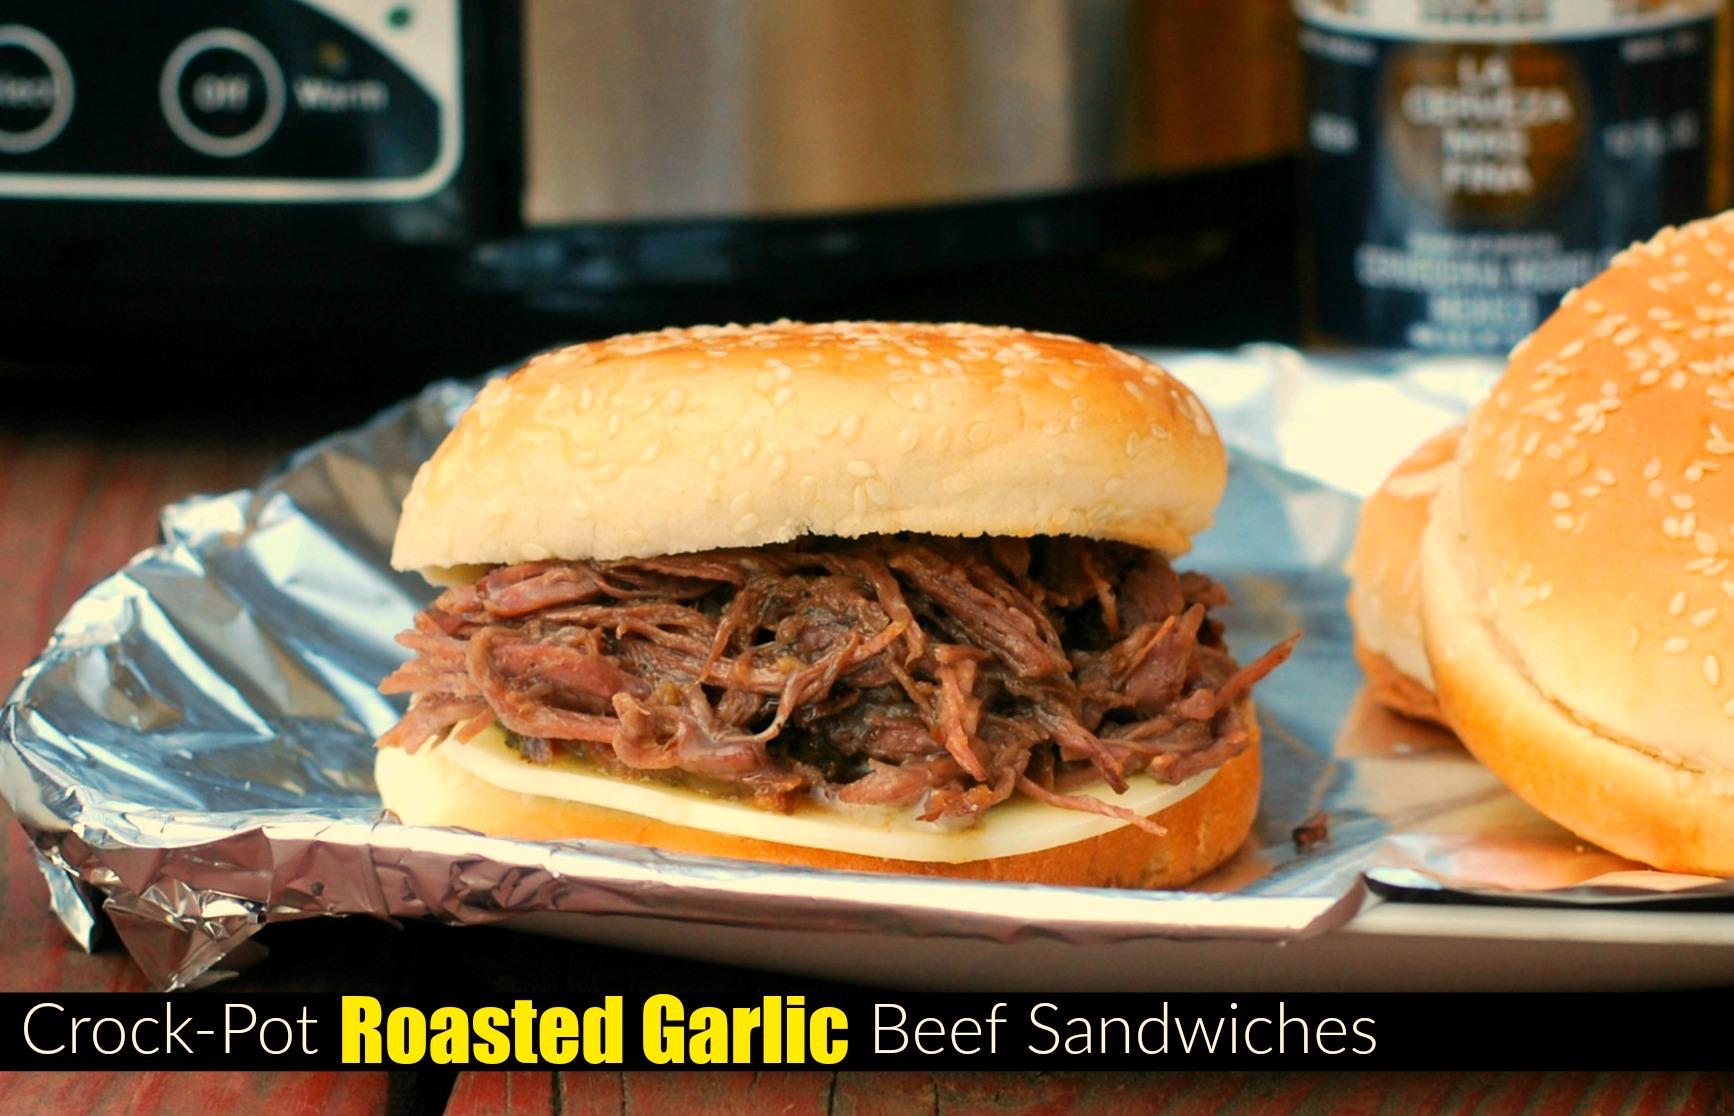 Crock Pot Roasted Garlic Beef Sandwiches